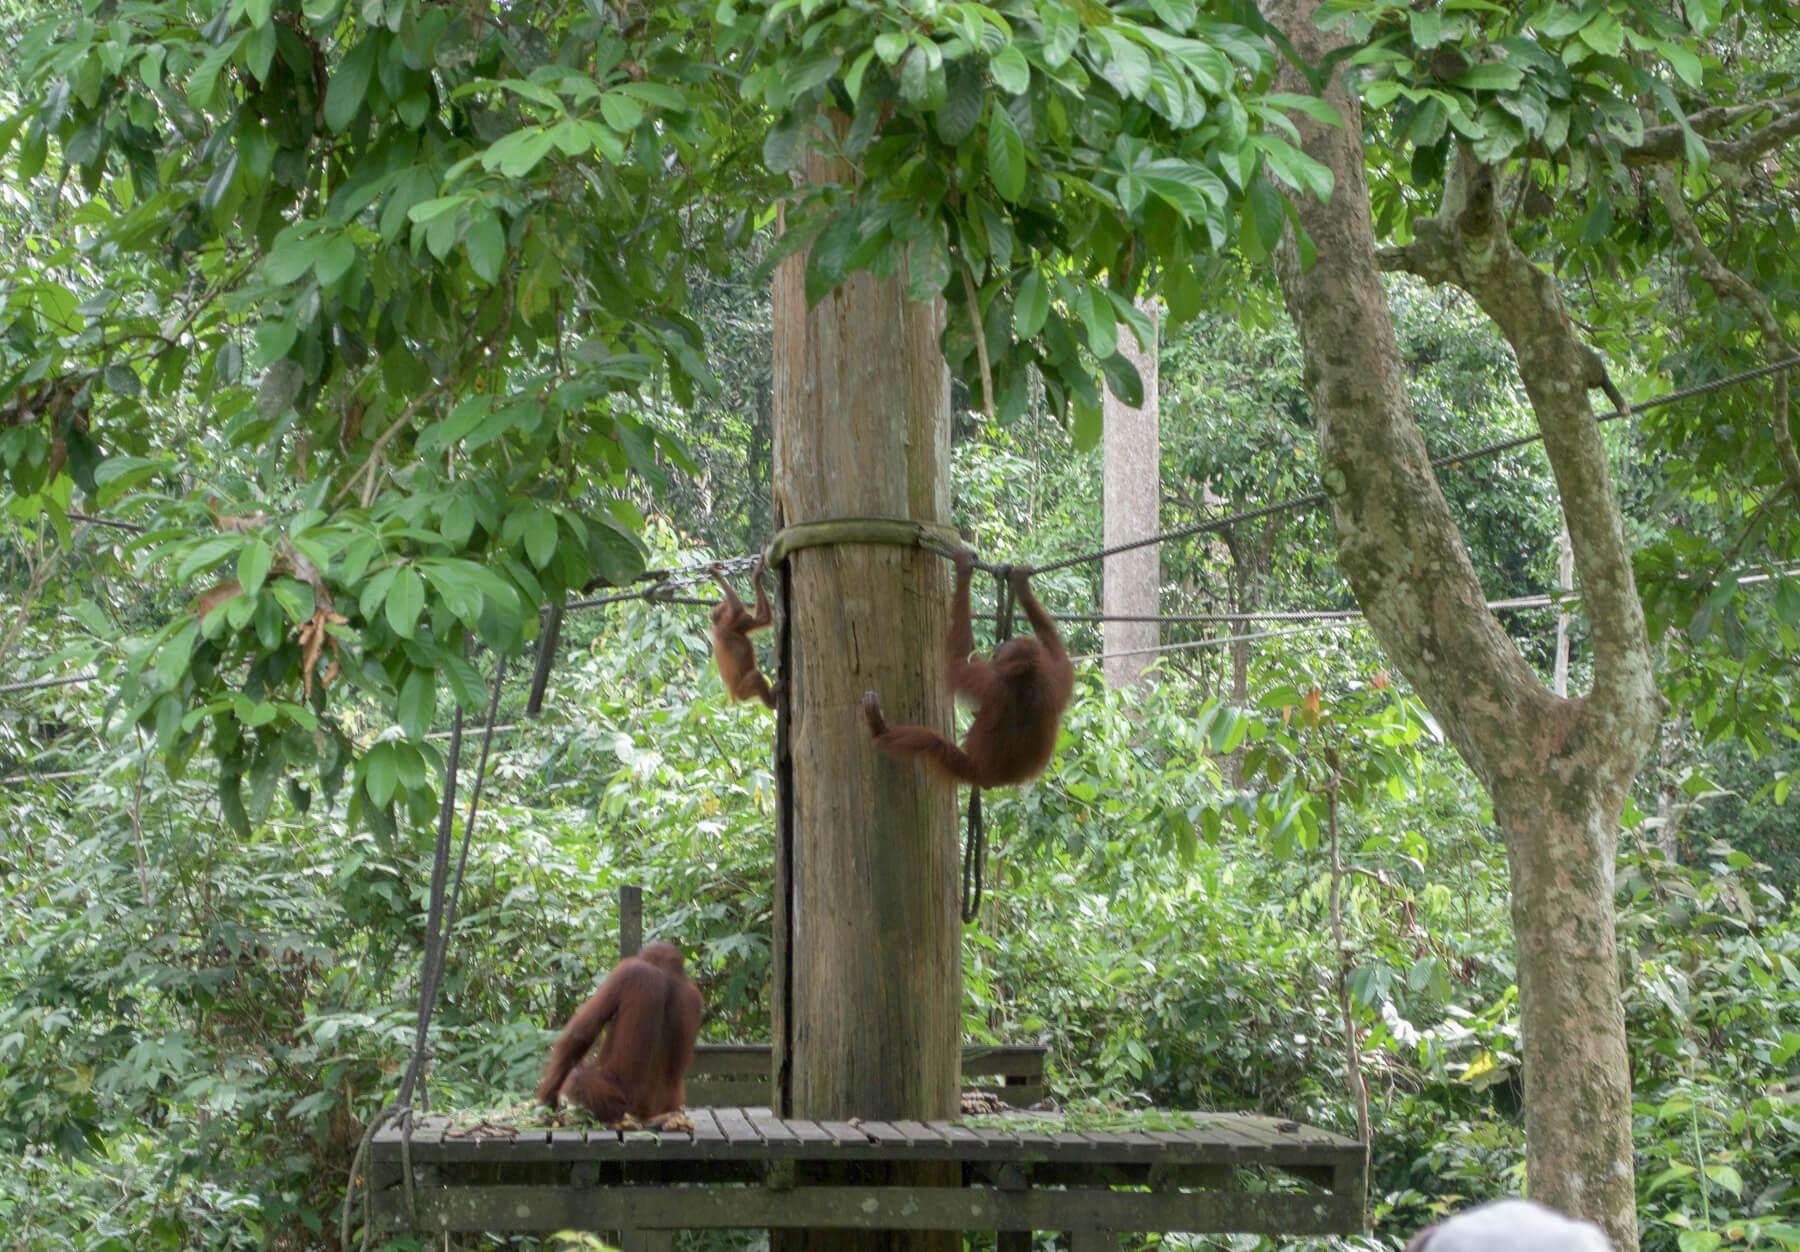 2 orangutans and a baby feeding at the Sepilok Rehabilitation Centre